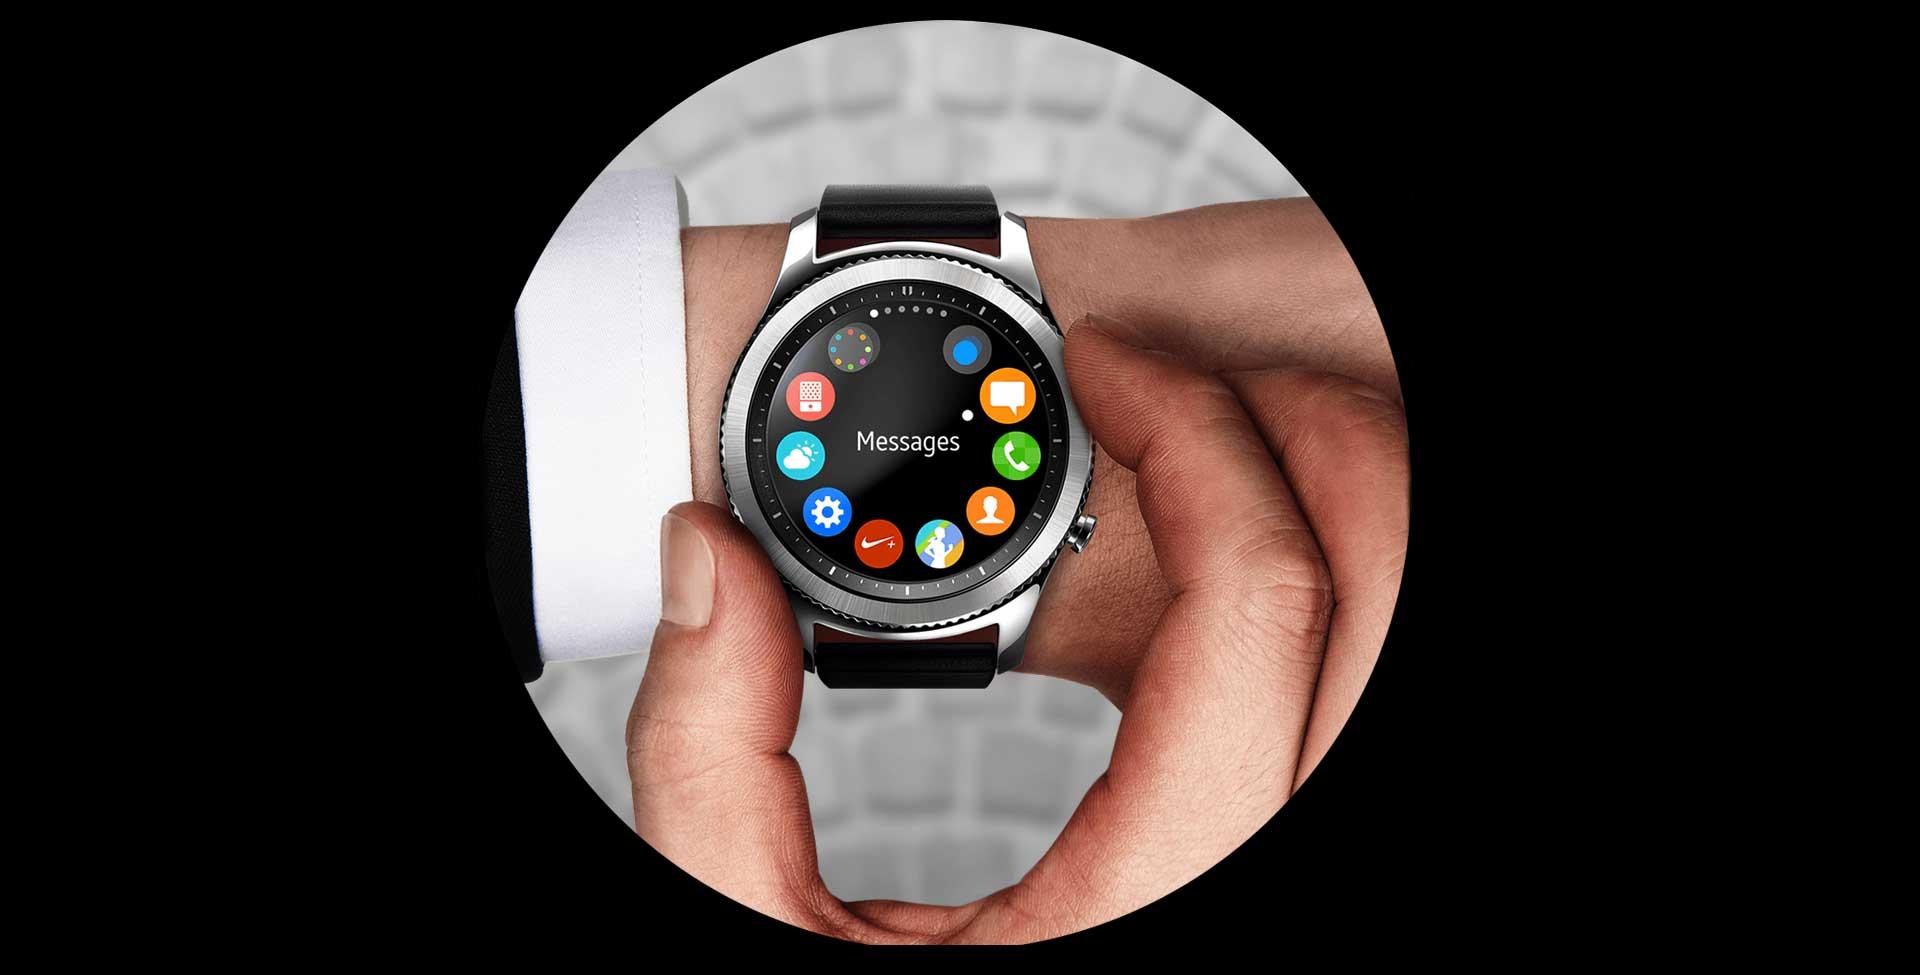 ساعت هوشمند اس 3 کلاسیک سامسونگ